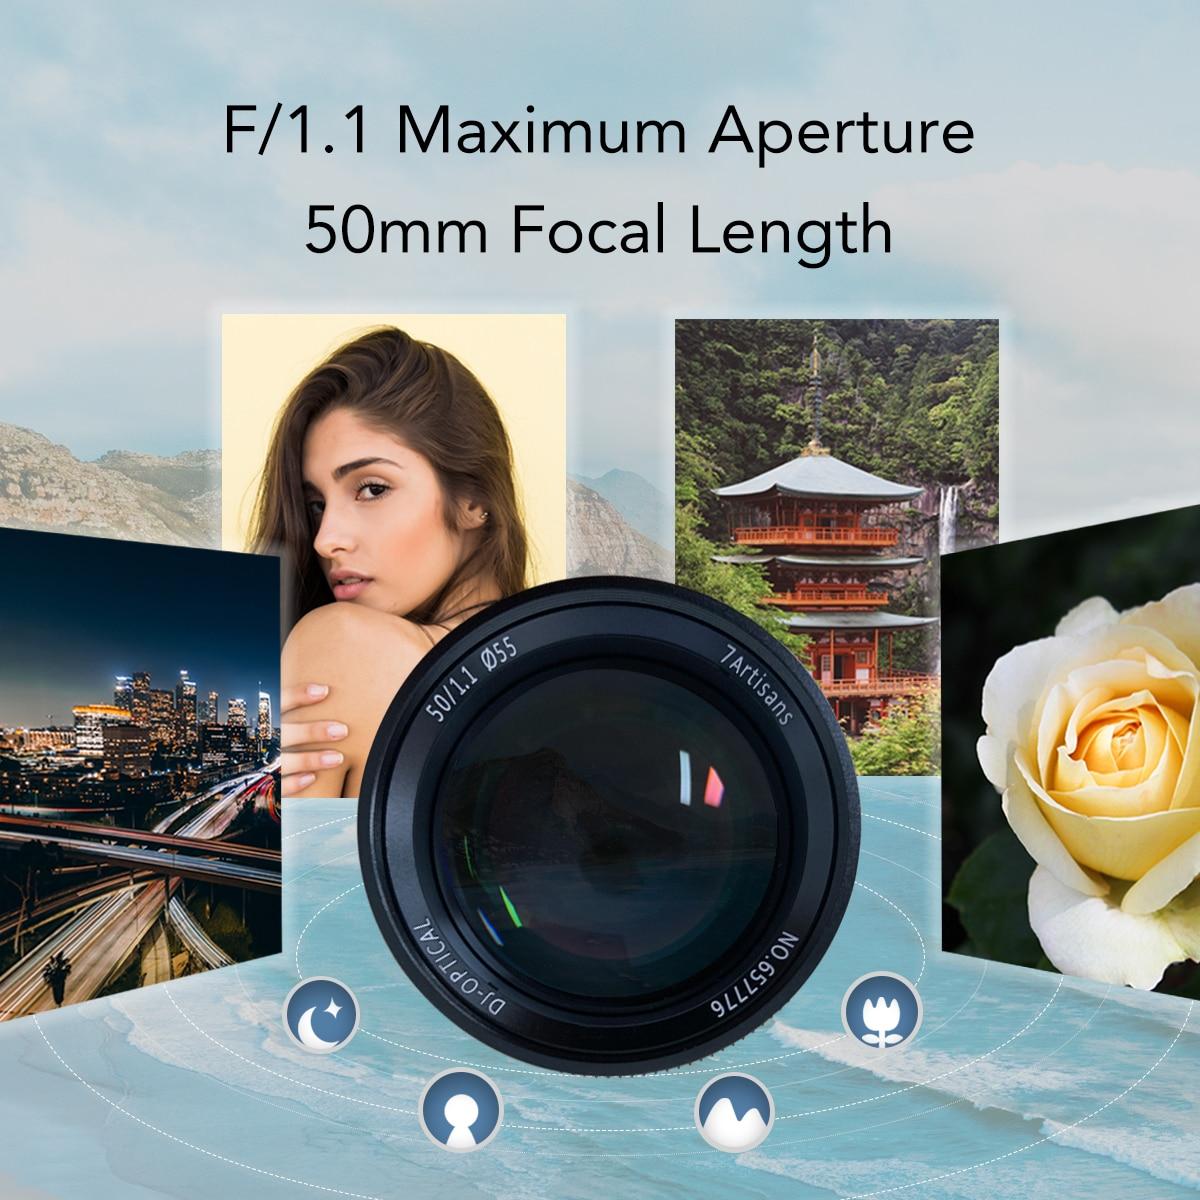 7 artesanos 50mm F1.1large apertura Paraxial M montaje de la lente para las cámaras M M240 M3 M5 M6 M7 M8 M9 M9p M10 - 2